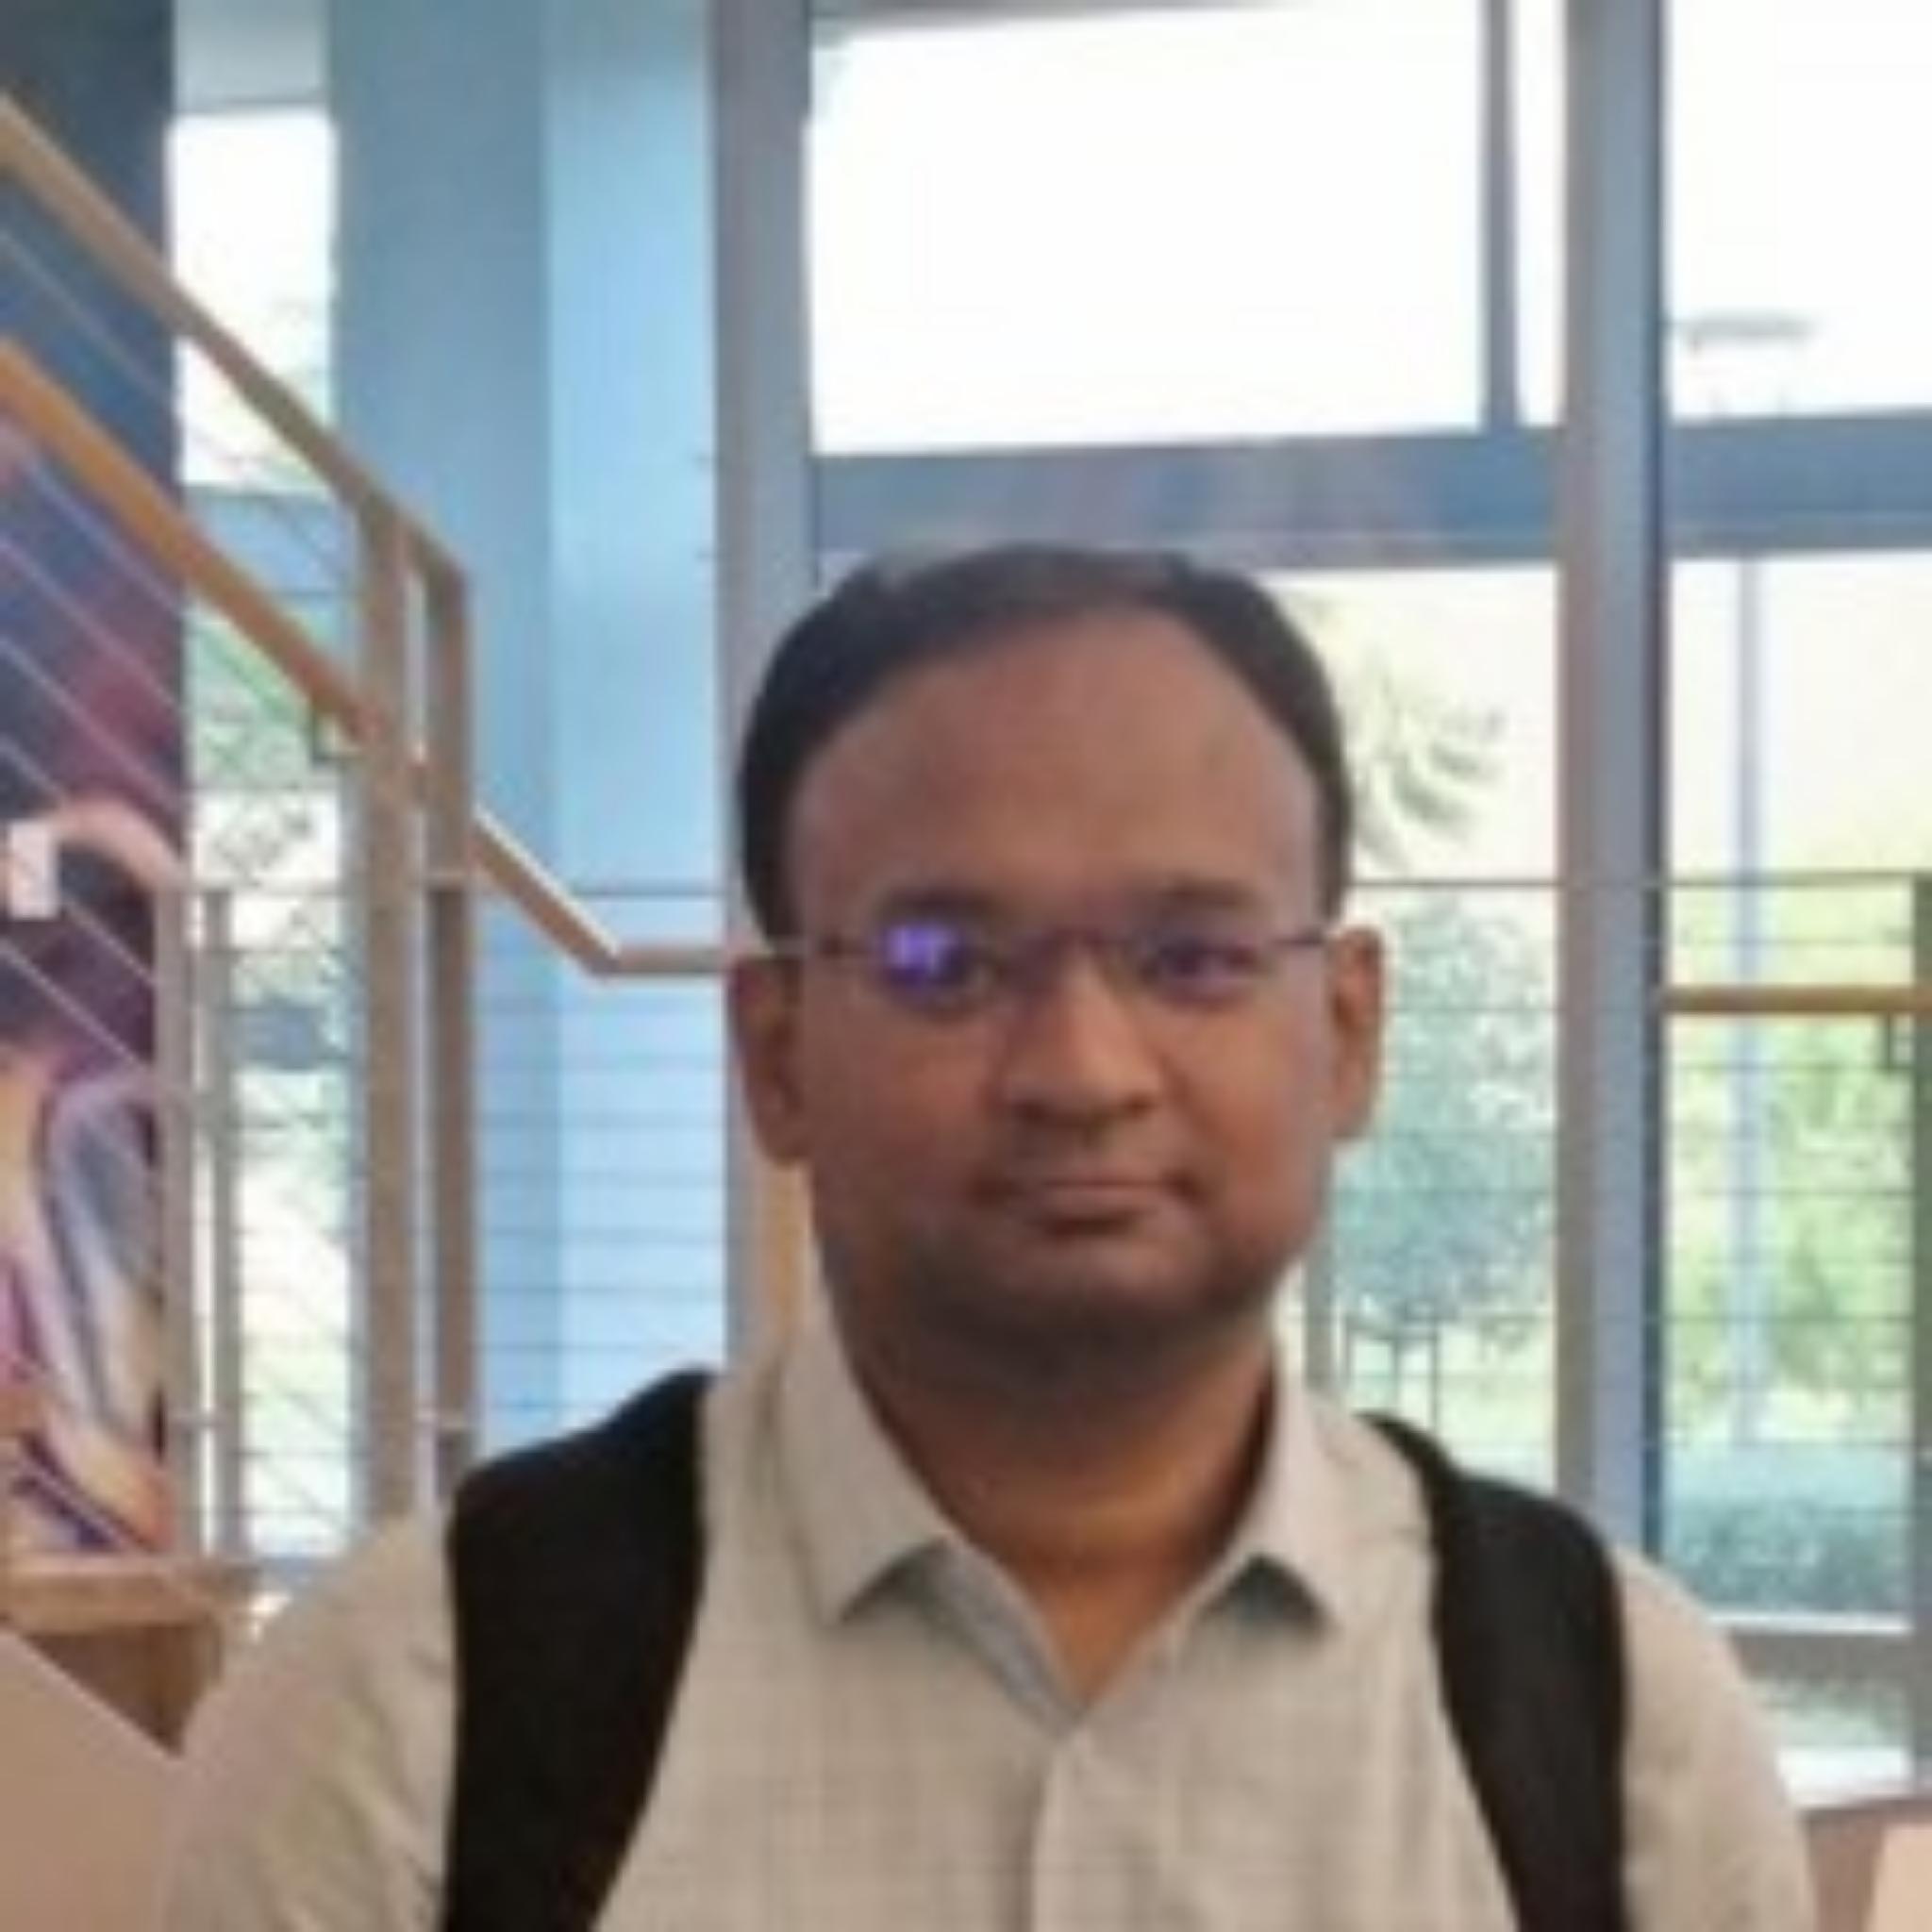 https://www.indiantelevision.com/sites/default/files/styles/smartcrop_800x800/public/images/tv-images/2021/07/07/photogrid_plus_1625637445148.jpg?itok=92LJEdOb